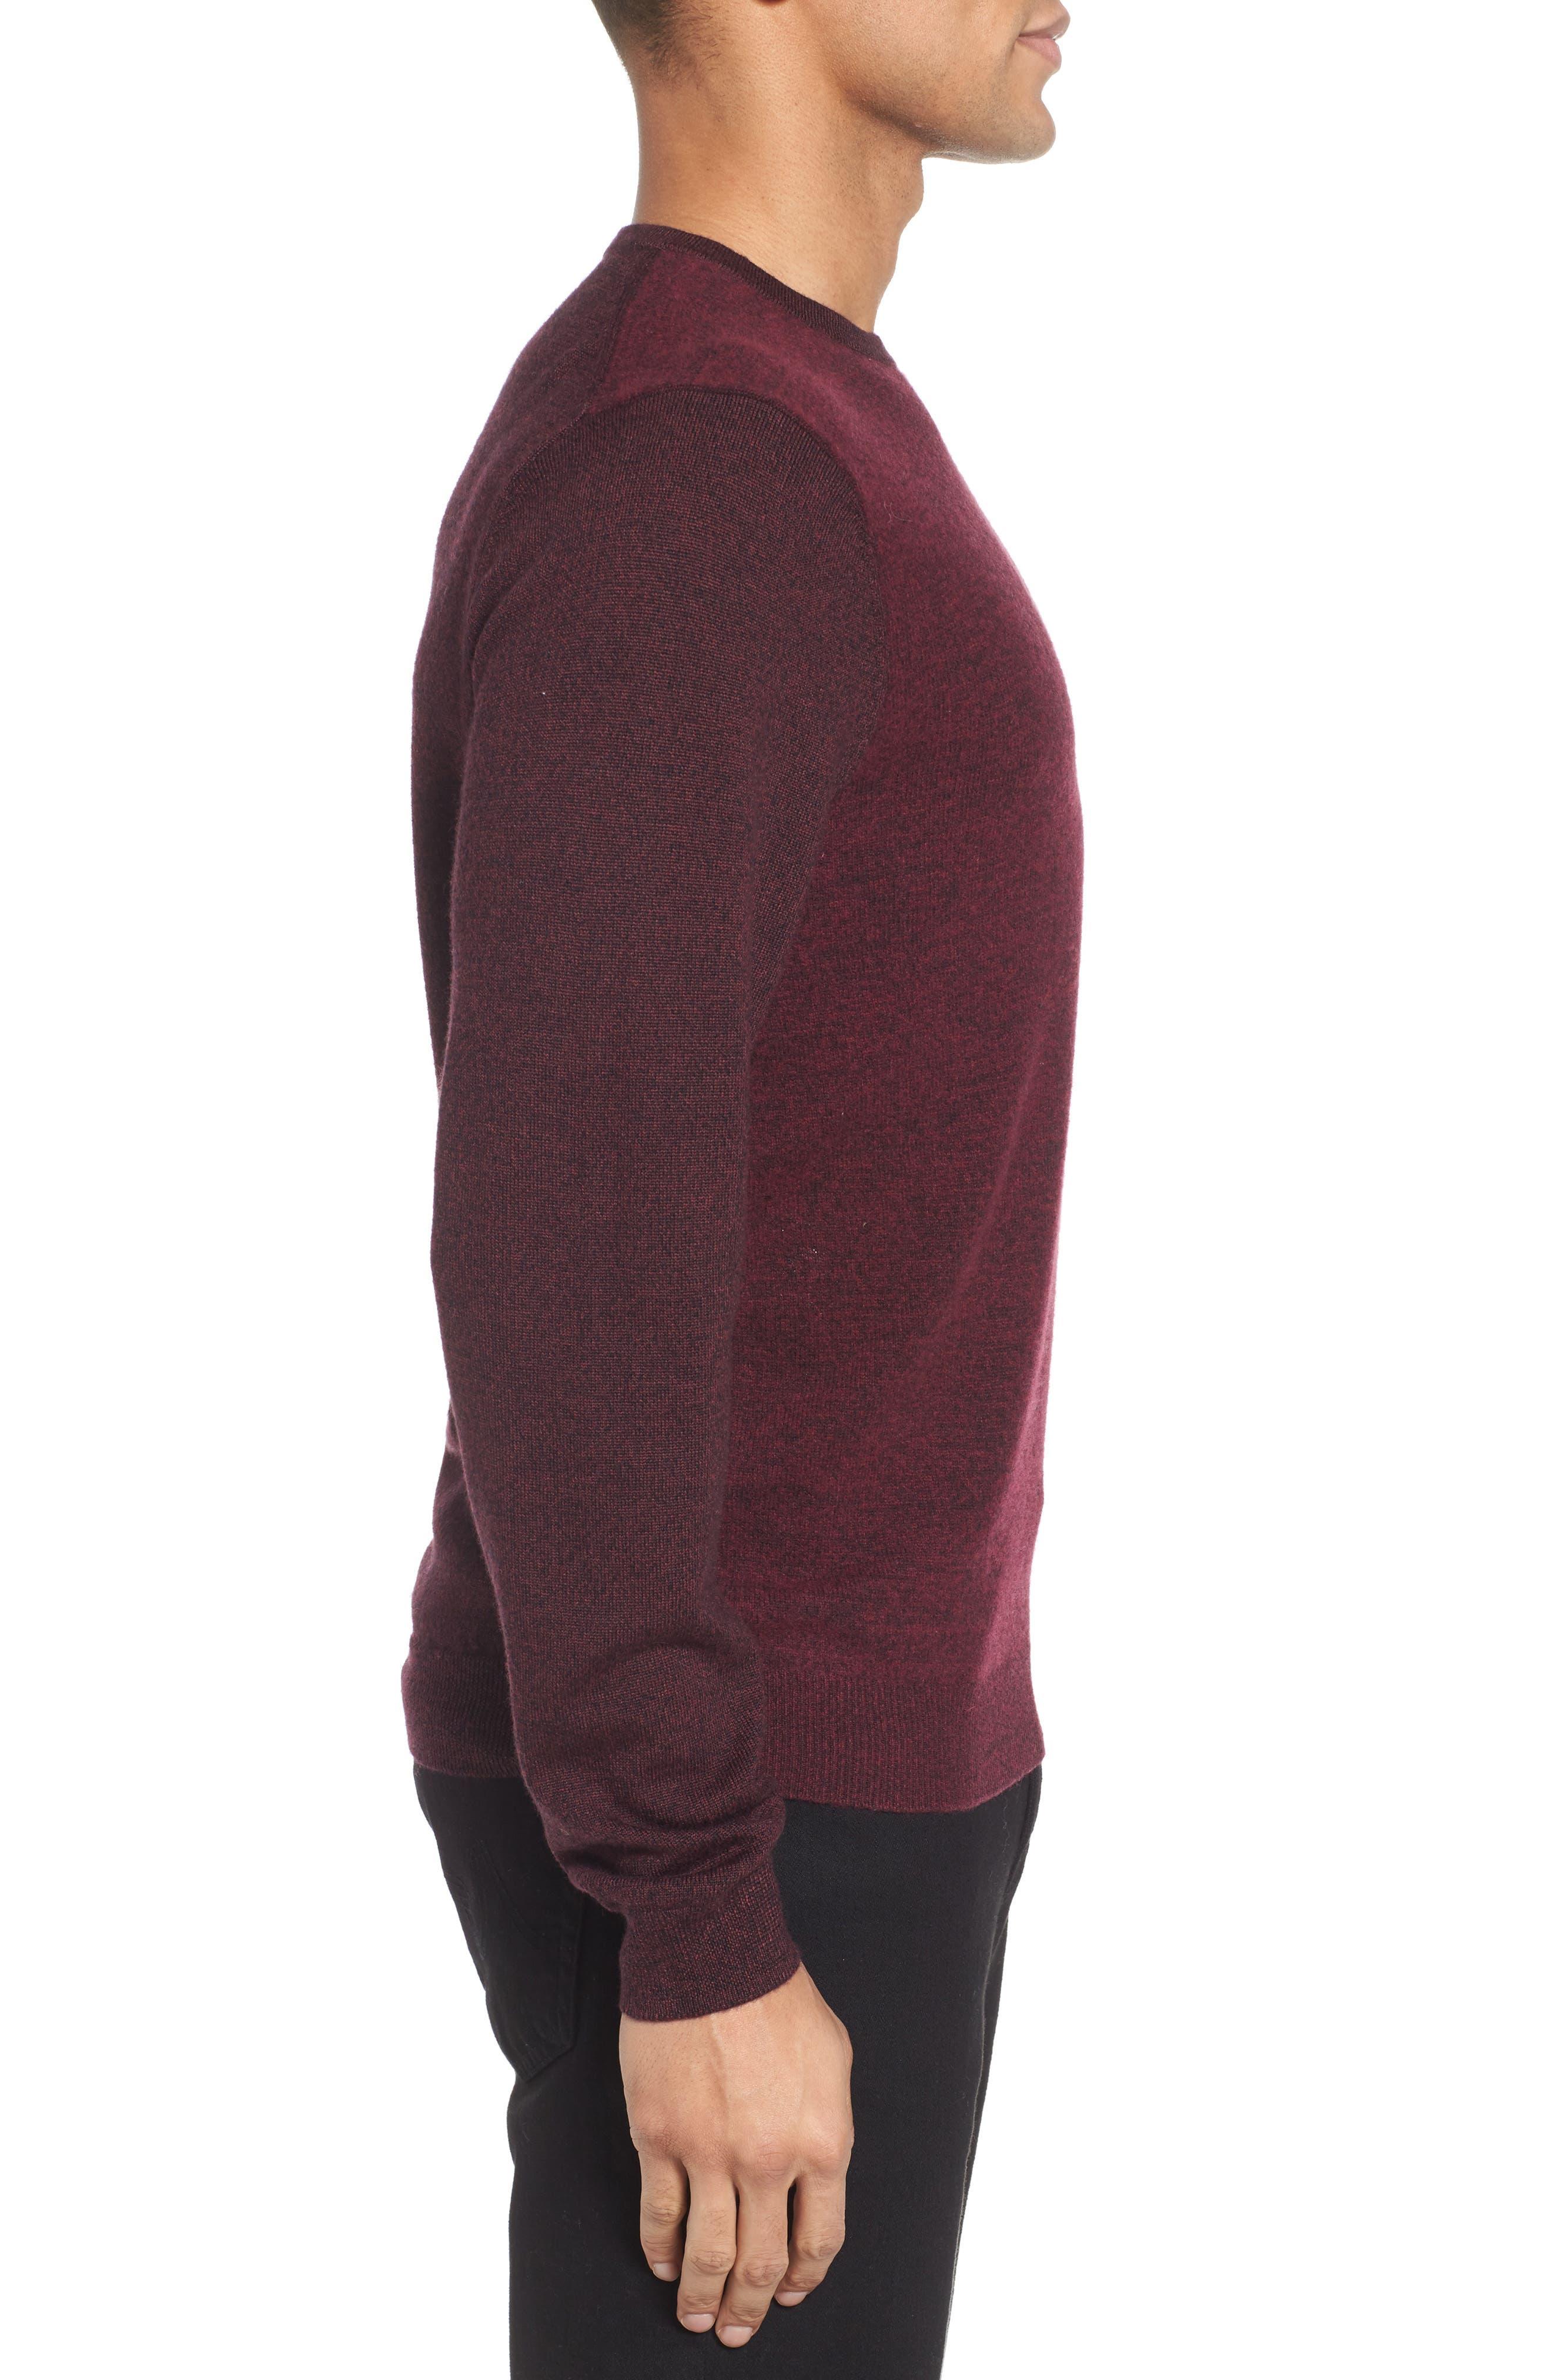 Boiled Wool Blend Crewneck Sweater,                             Alternate thumbnail 3, color,                             Burgundy Stem